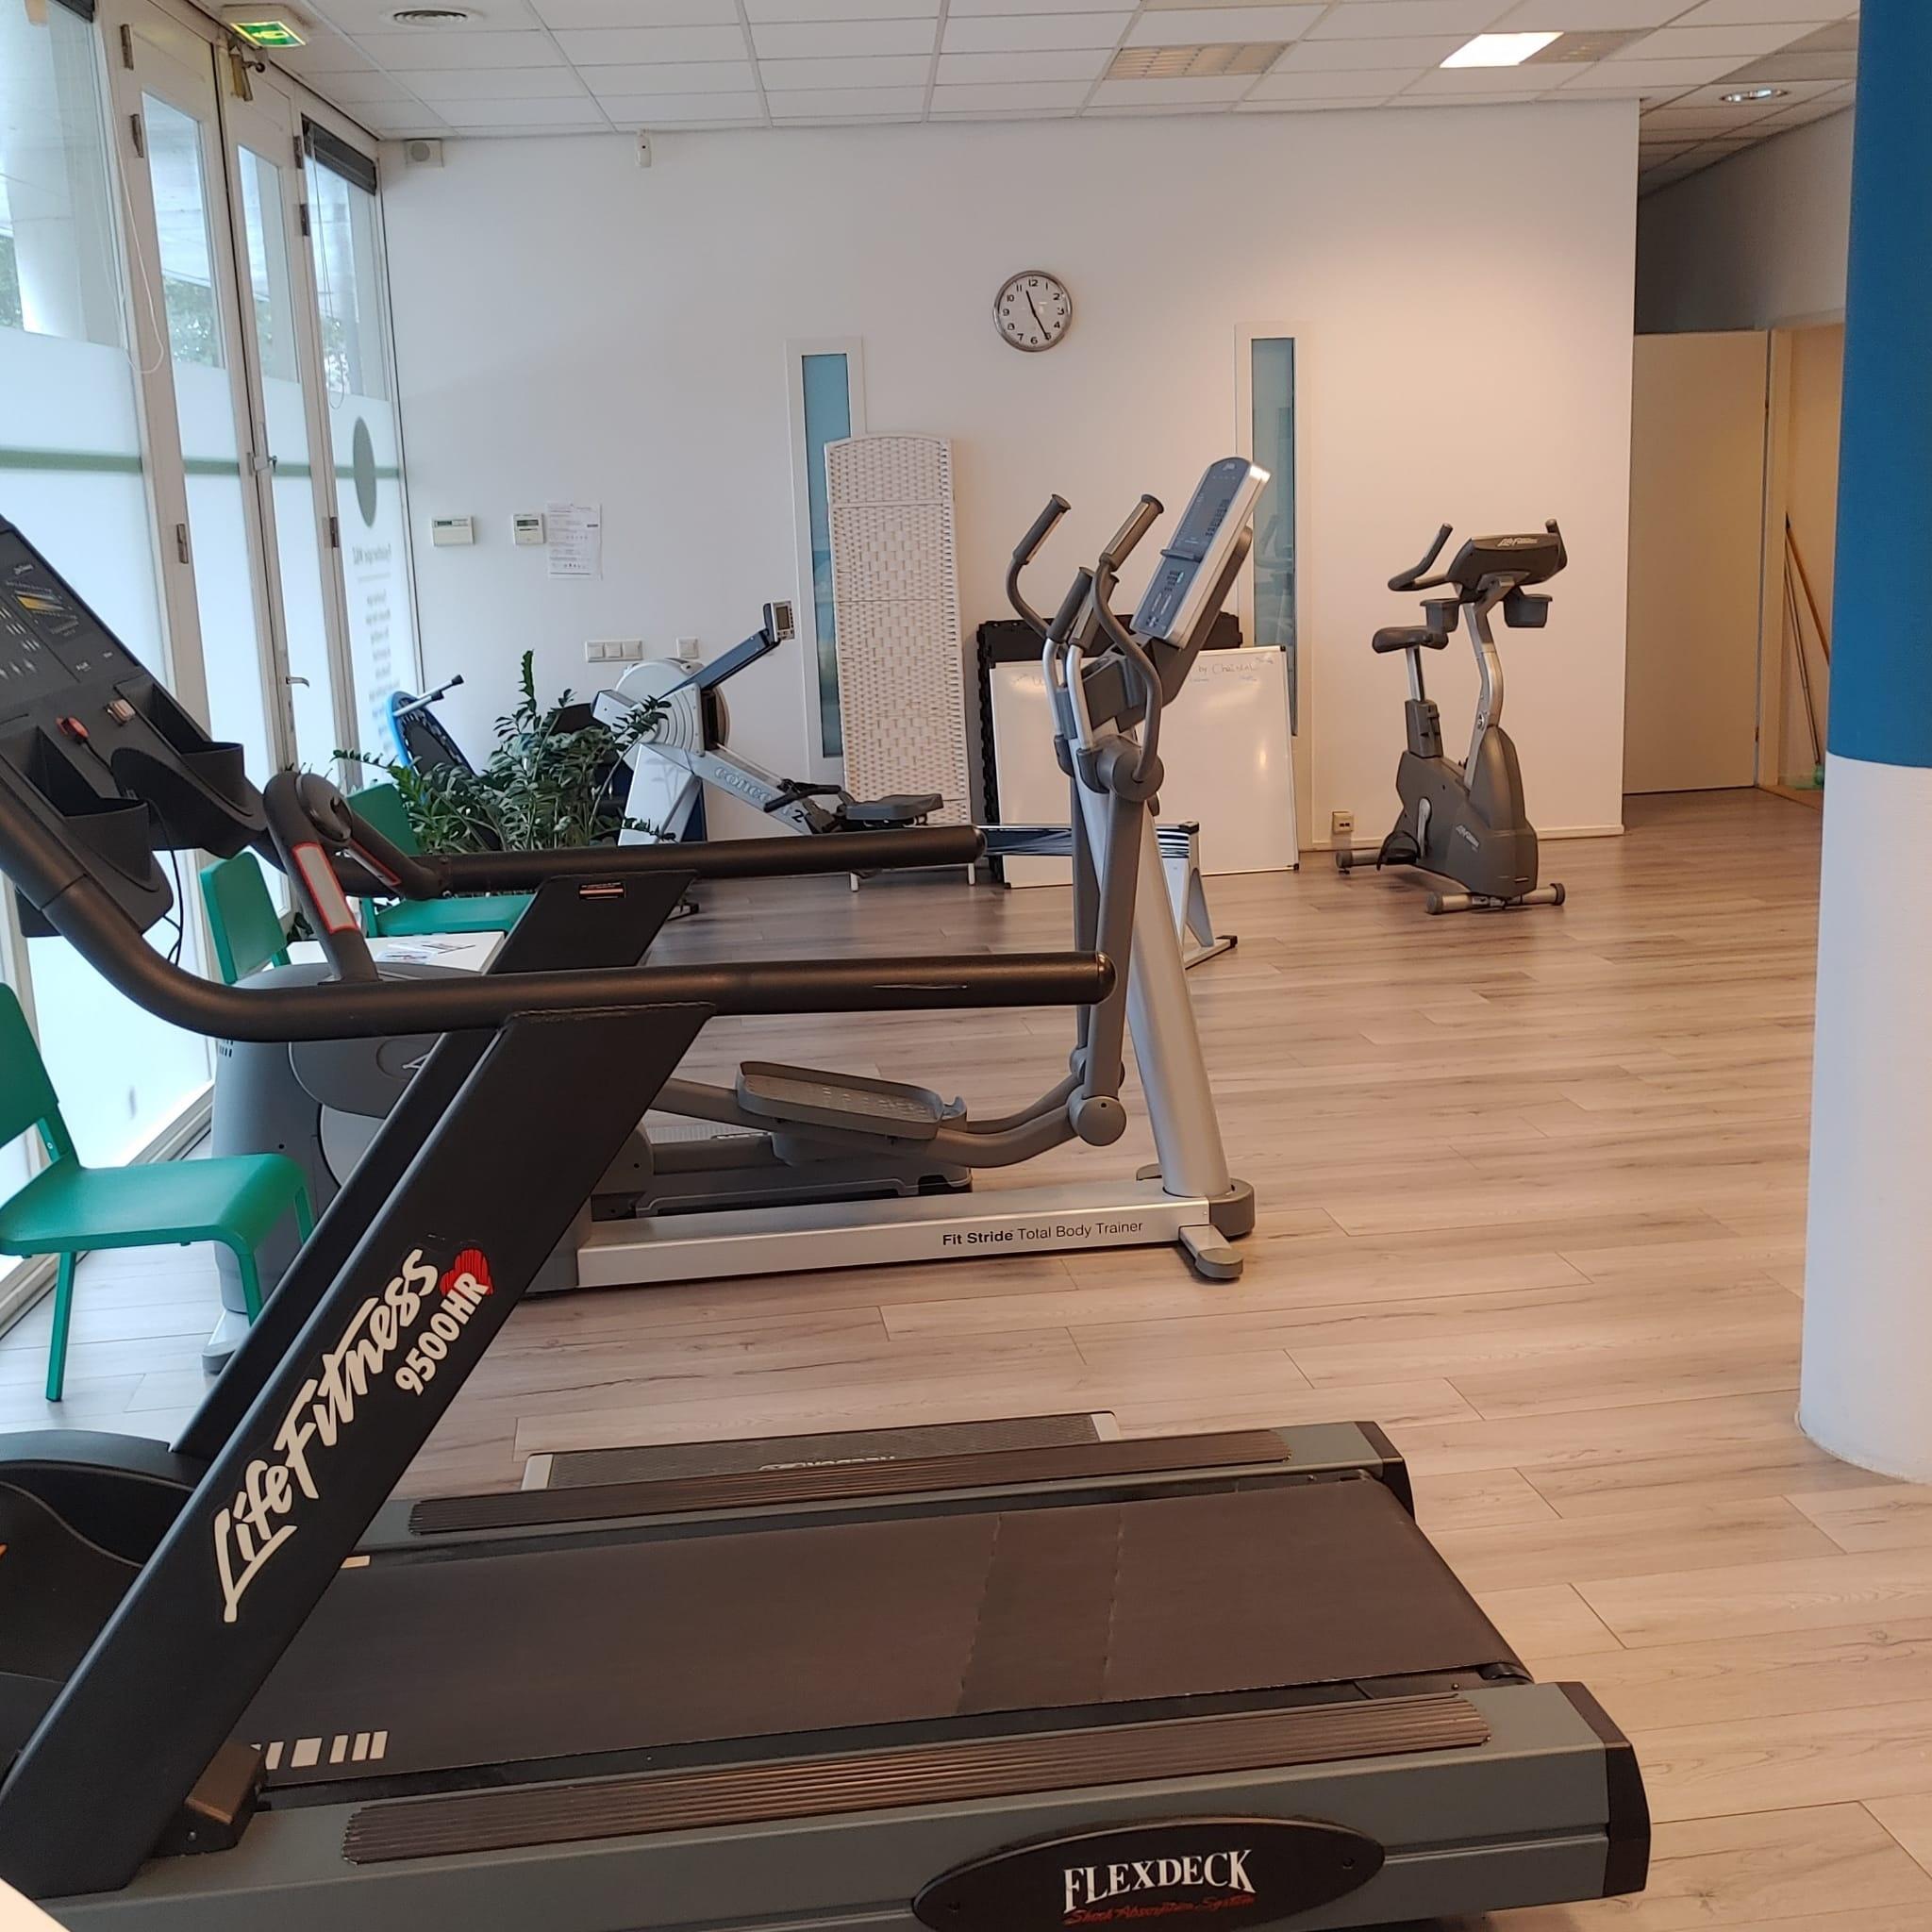 Medische fitness per 1 september weer herstart!